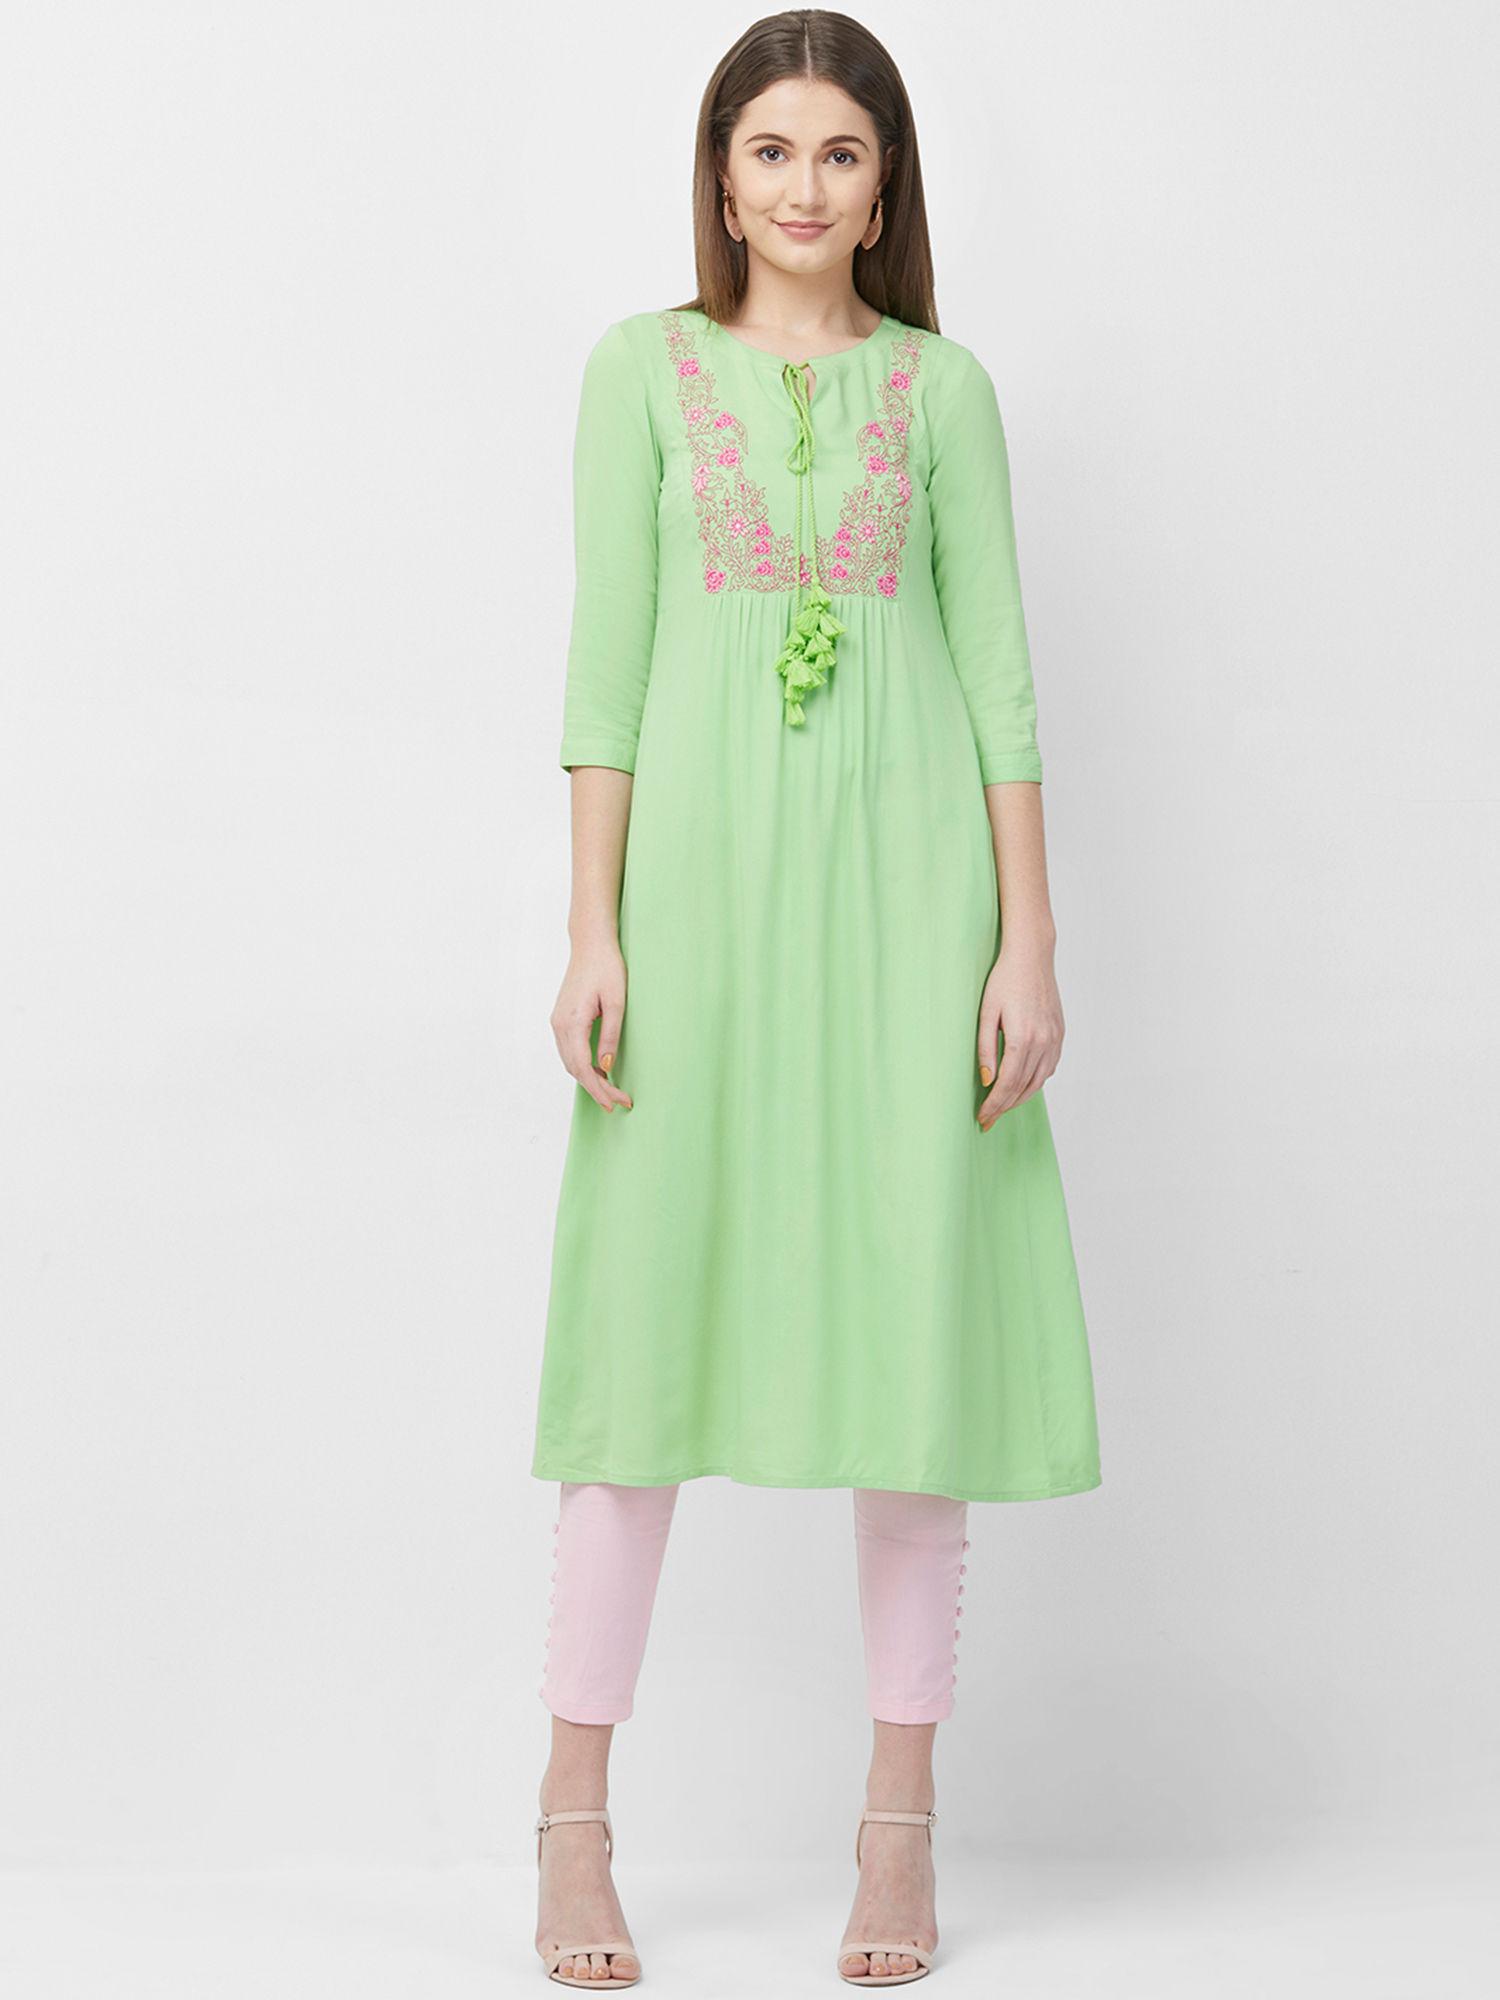 Ladies Kurti Designer Ethnic Straight Rayon Kurta Front Casual Party Dress Tunic